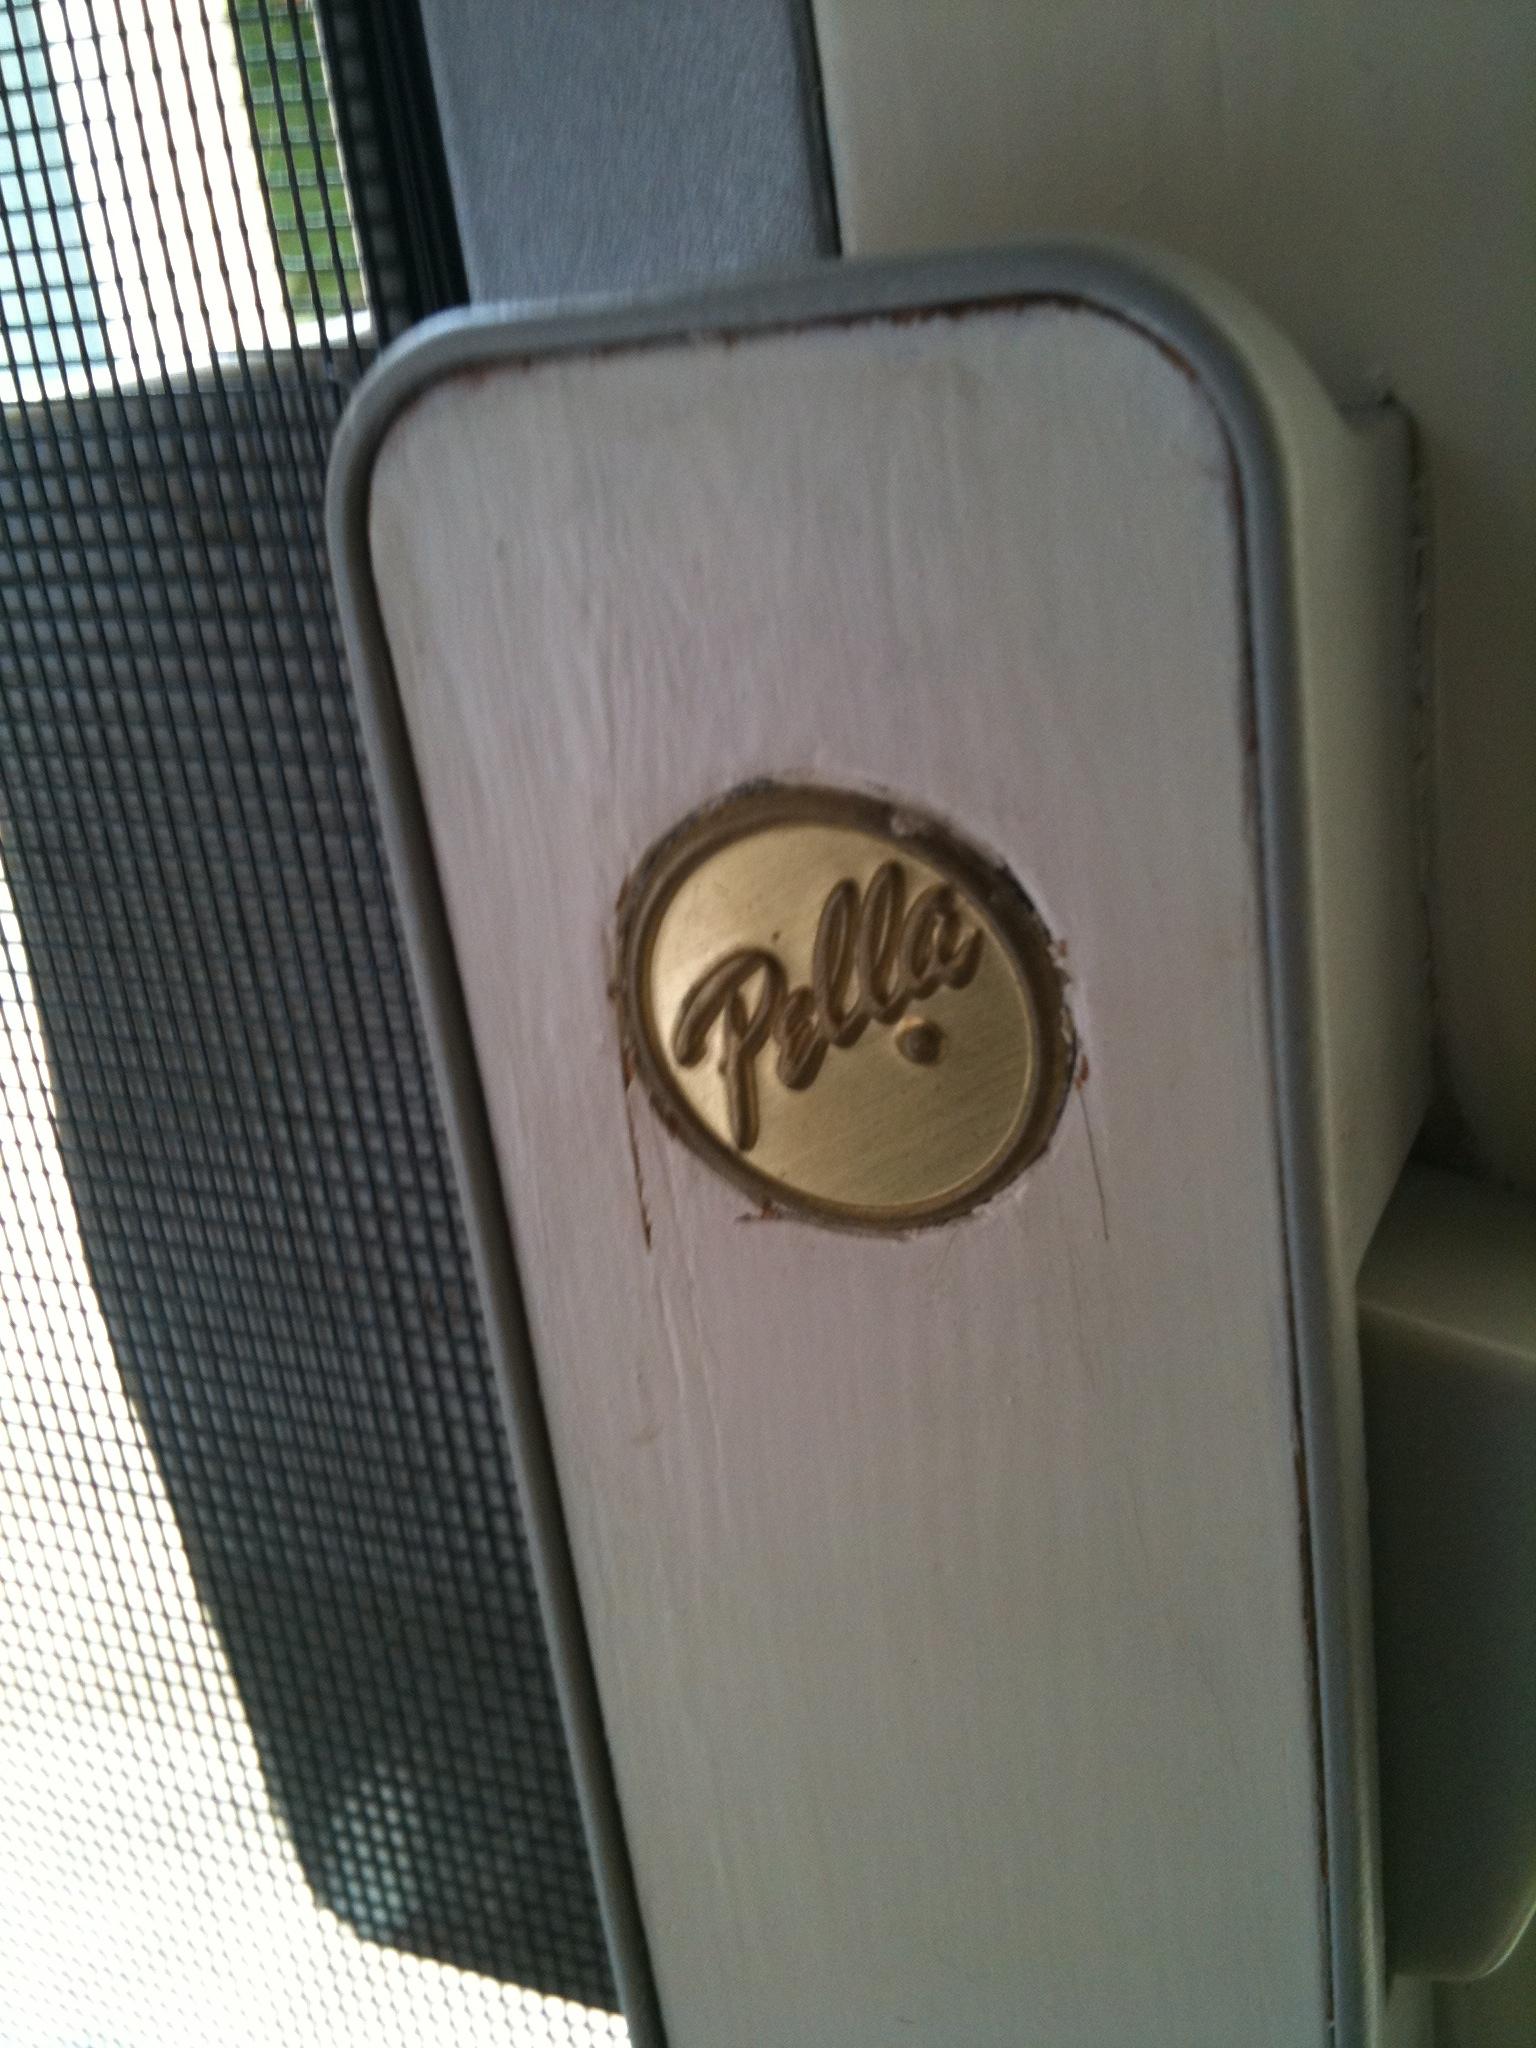 Pella Sliding Screen Door Handlerescreening a pella screen door screen door and window screen